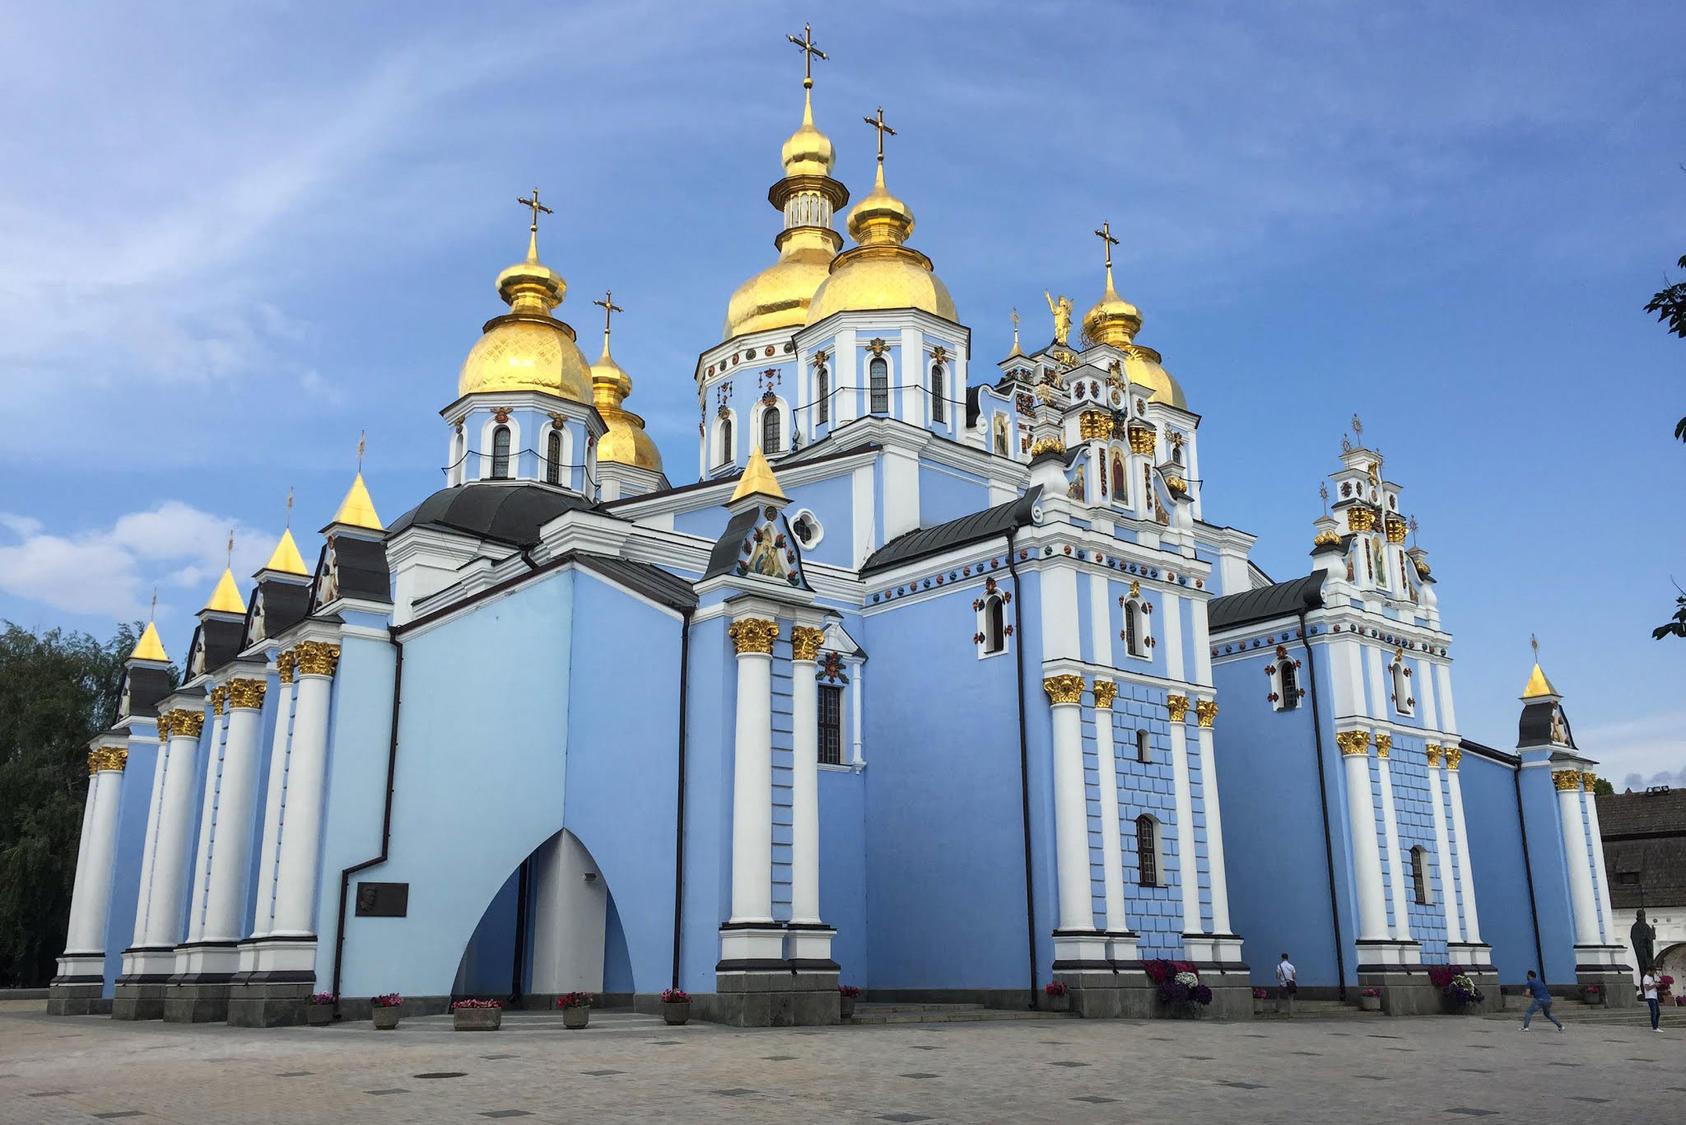 St. Michael's Golden-Domed Monastery, Kyiv, Ukraine. (Photo courtesy of Charles North)